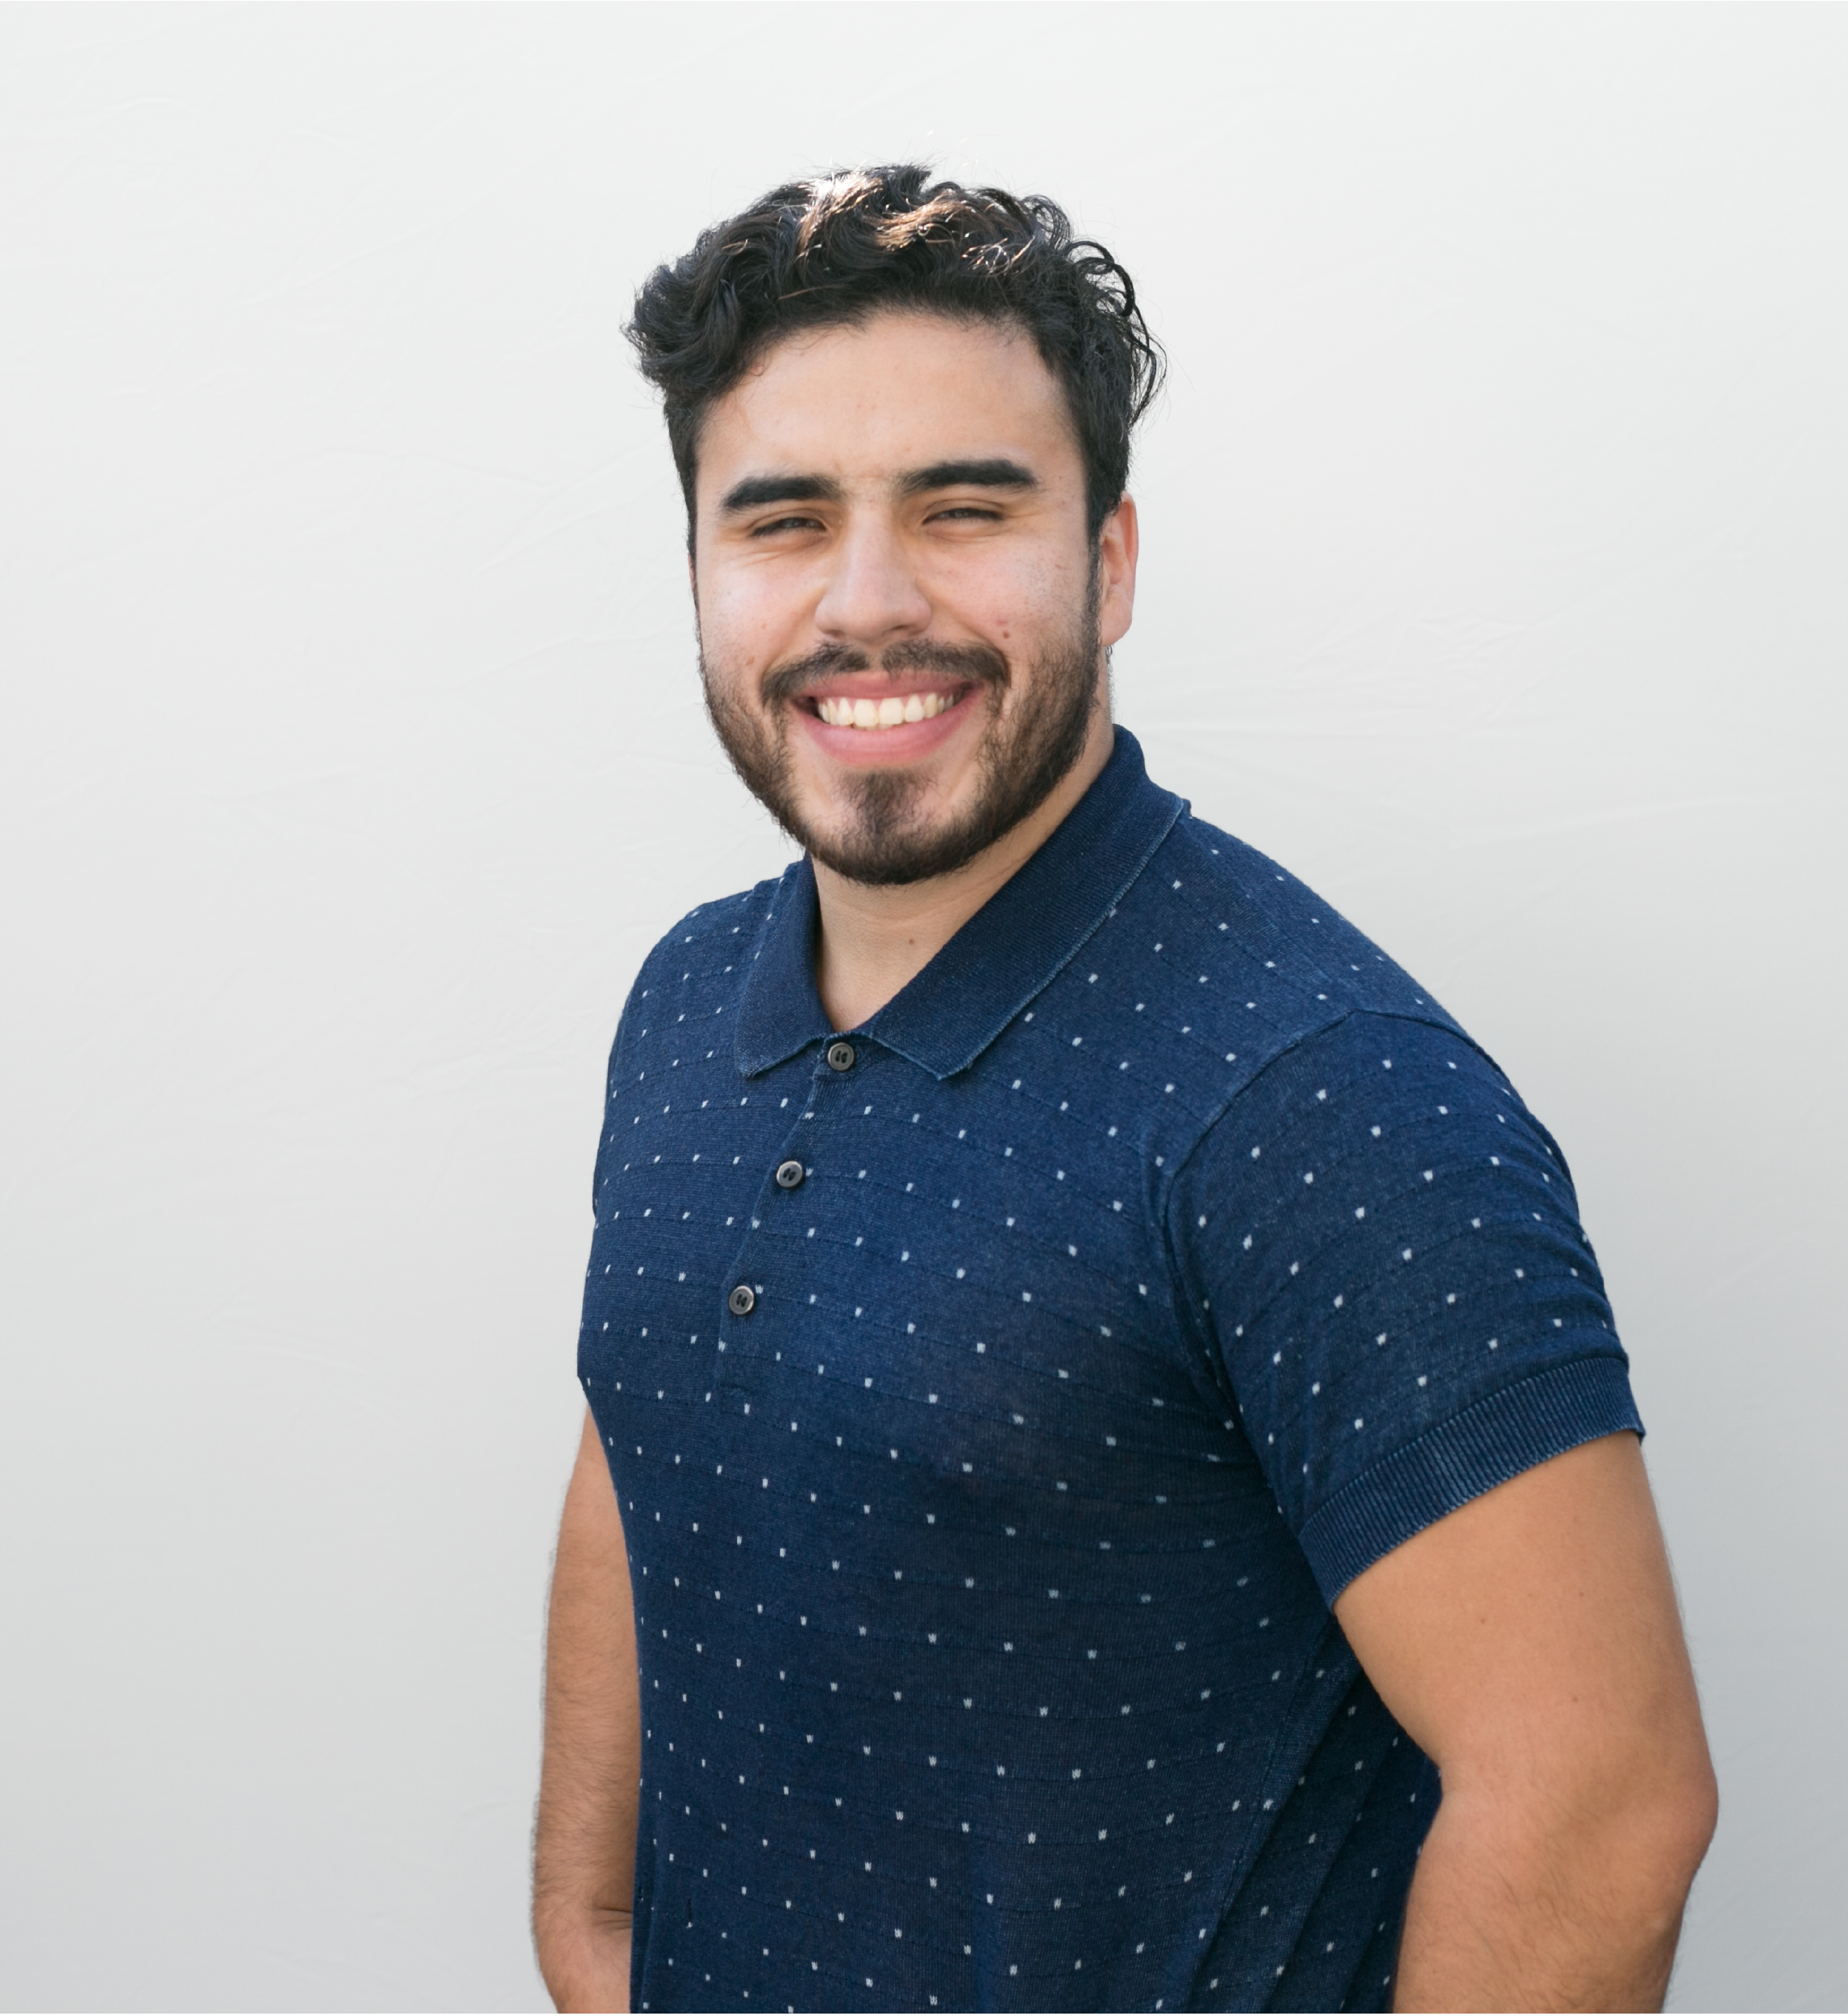 Joshua Tapia